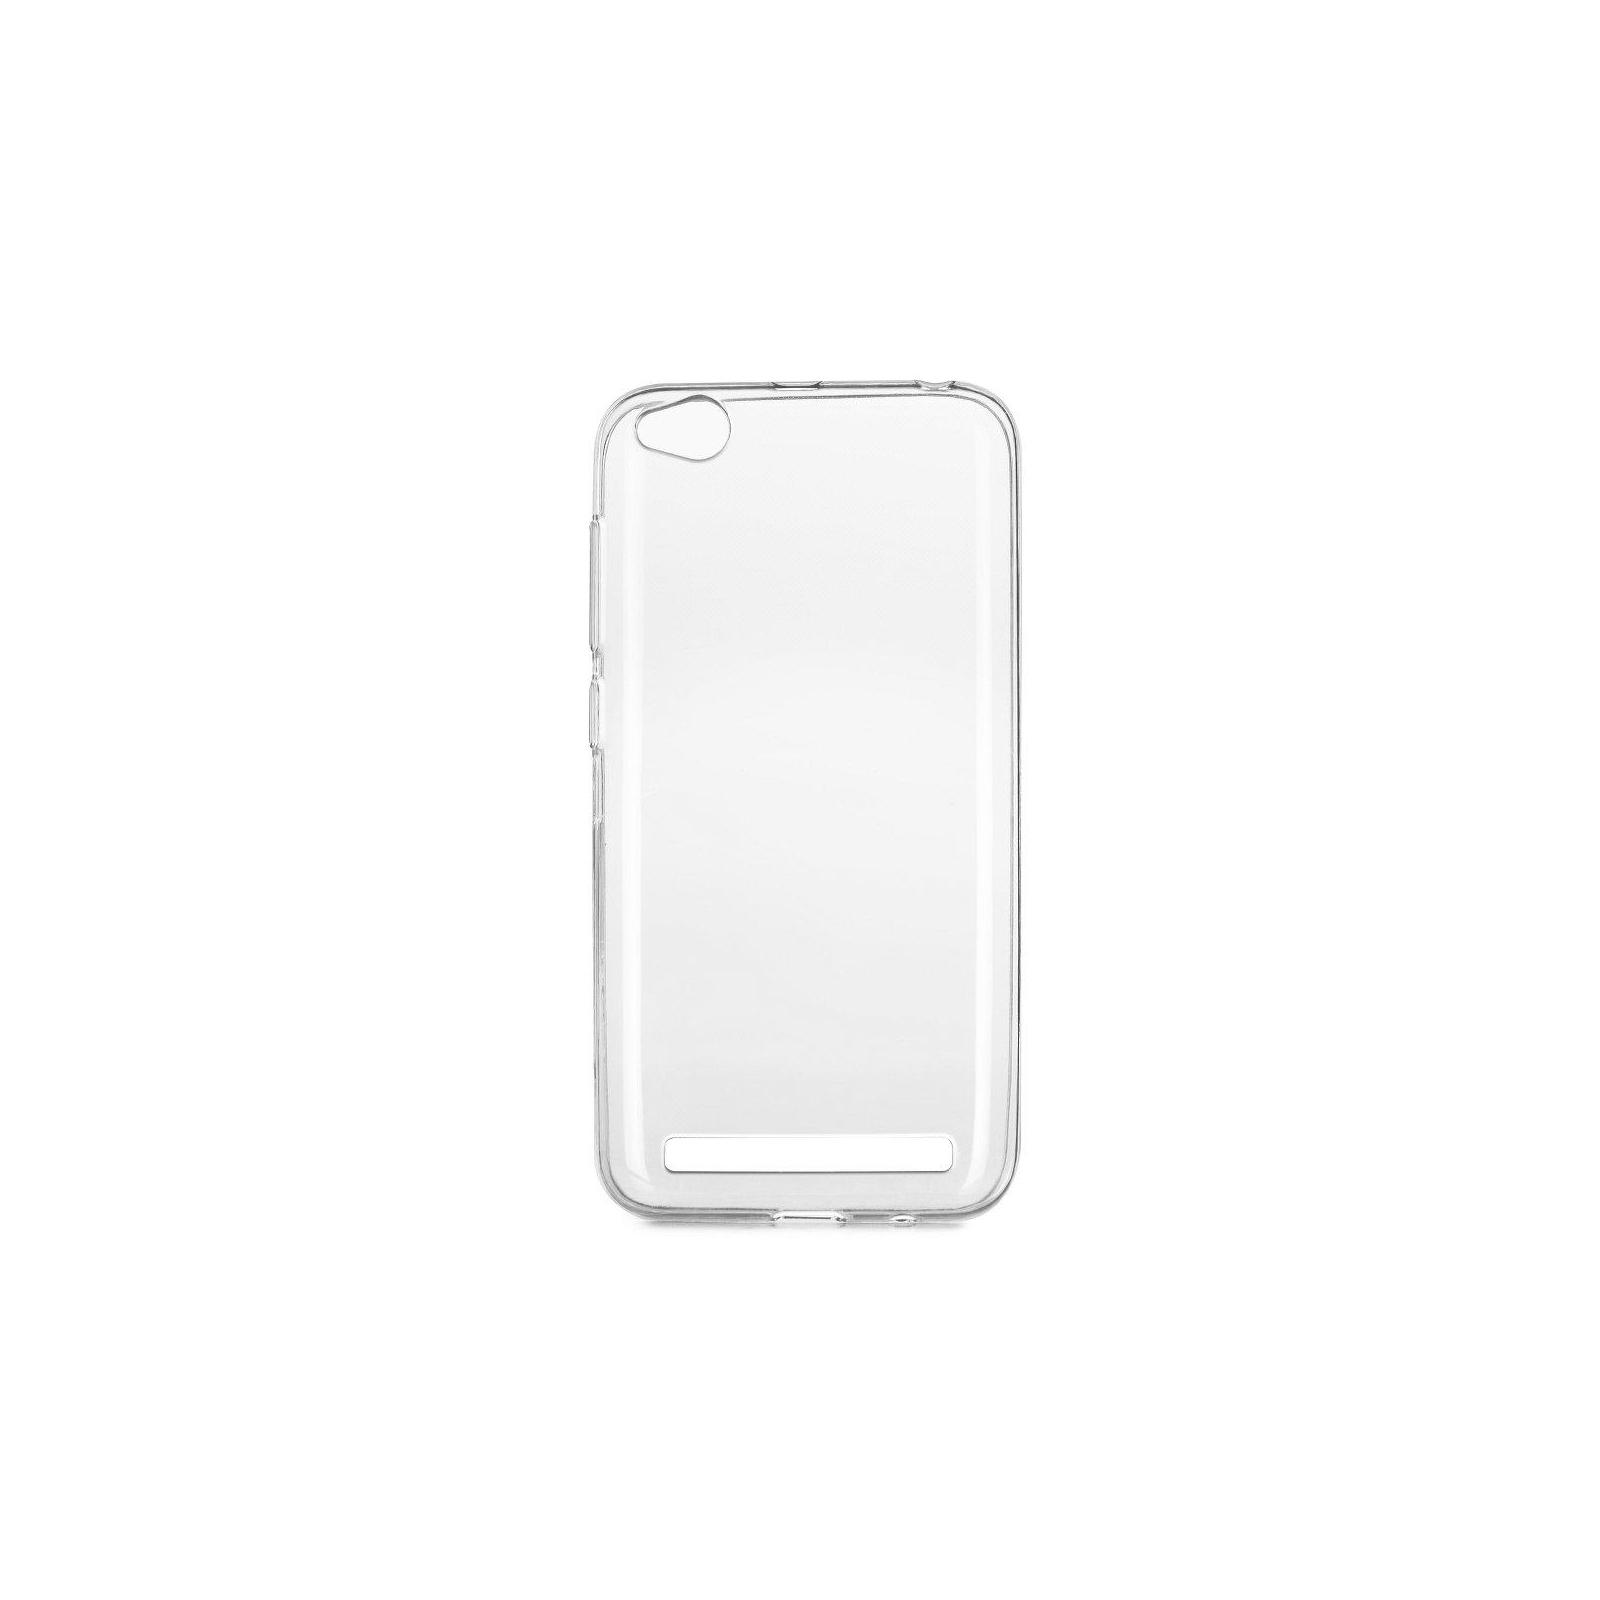 Чехол для моб. телефона Laudtec для Xiaomi Redmi 5A Clear tpu (Transperent) (LC-XR5A) изображение 4